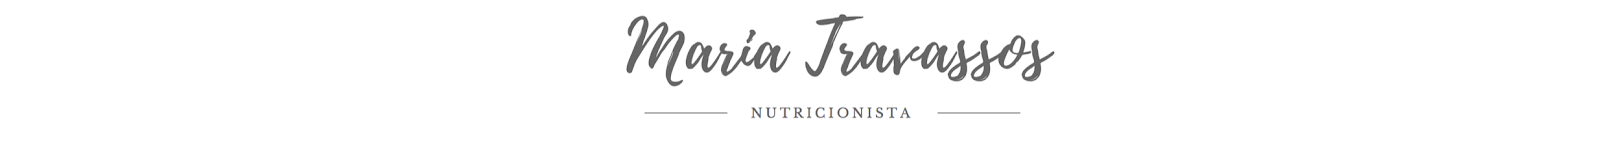 Maria Travassos - Nutricionista